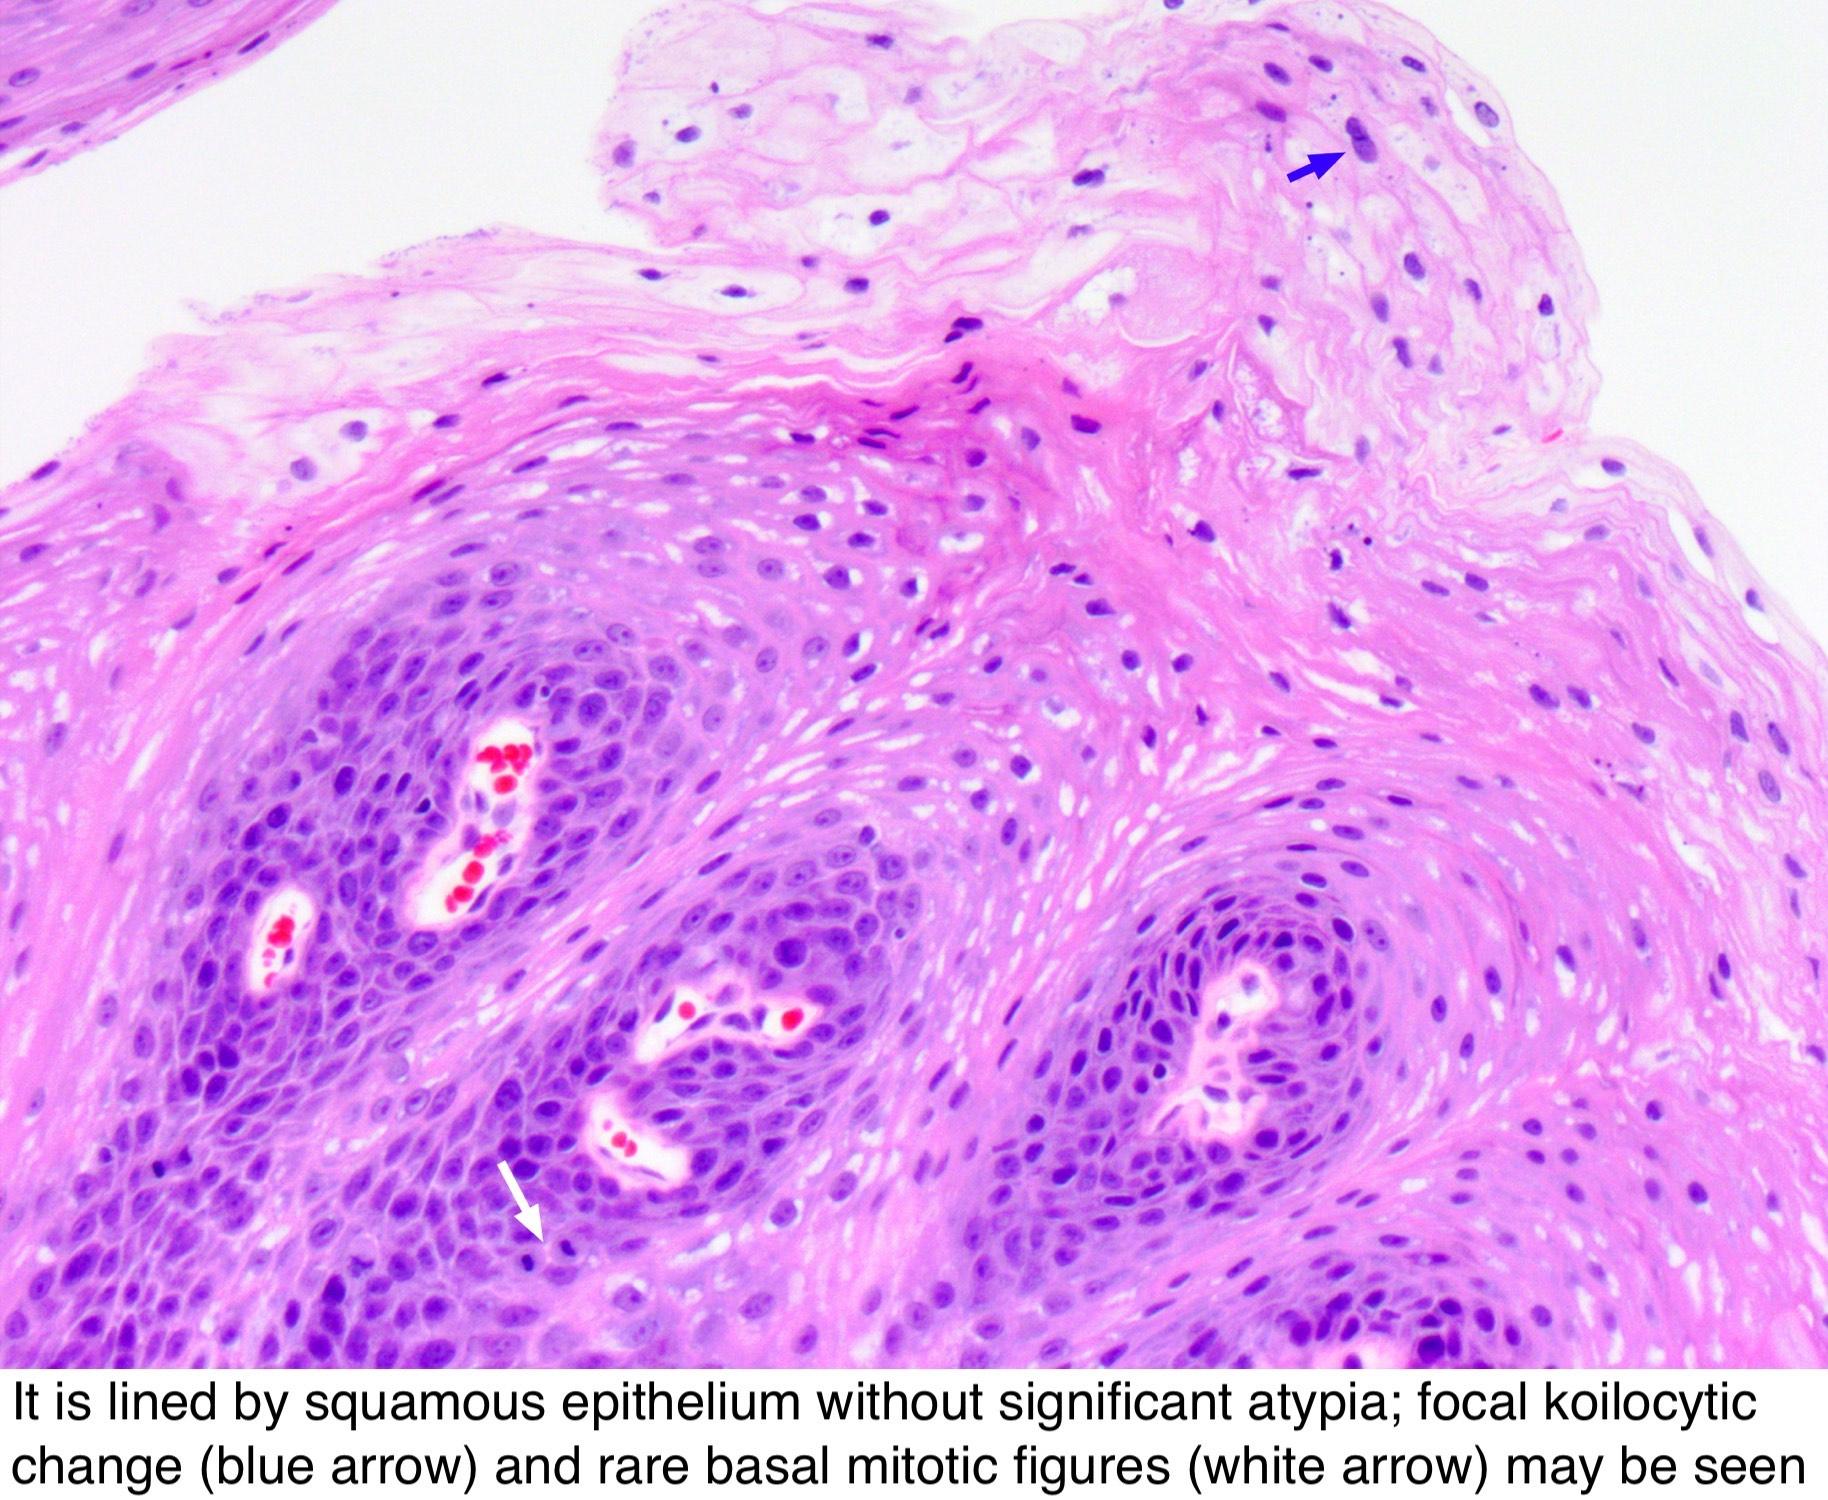 exophytic papilloma definition dysbiosis boy and bear